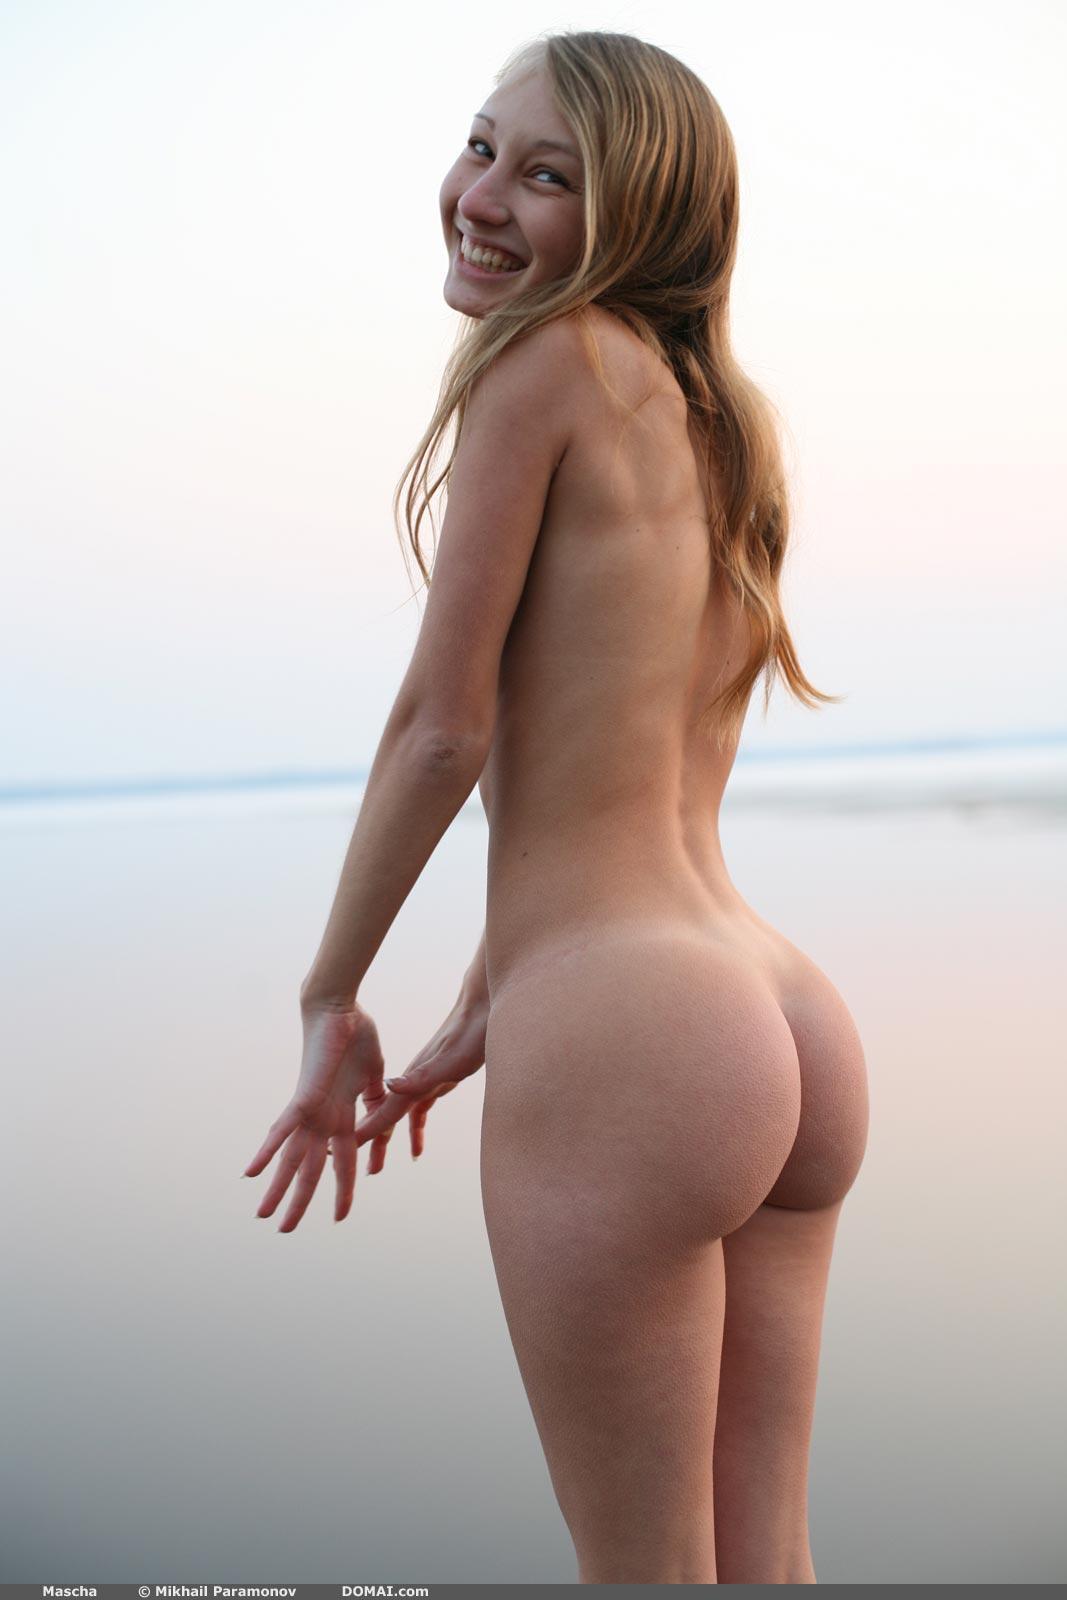 arhivach.org pimpandhost.com)  naked-@@@@@-arhivach.org-$ http:/